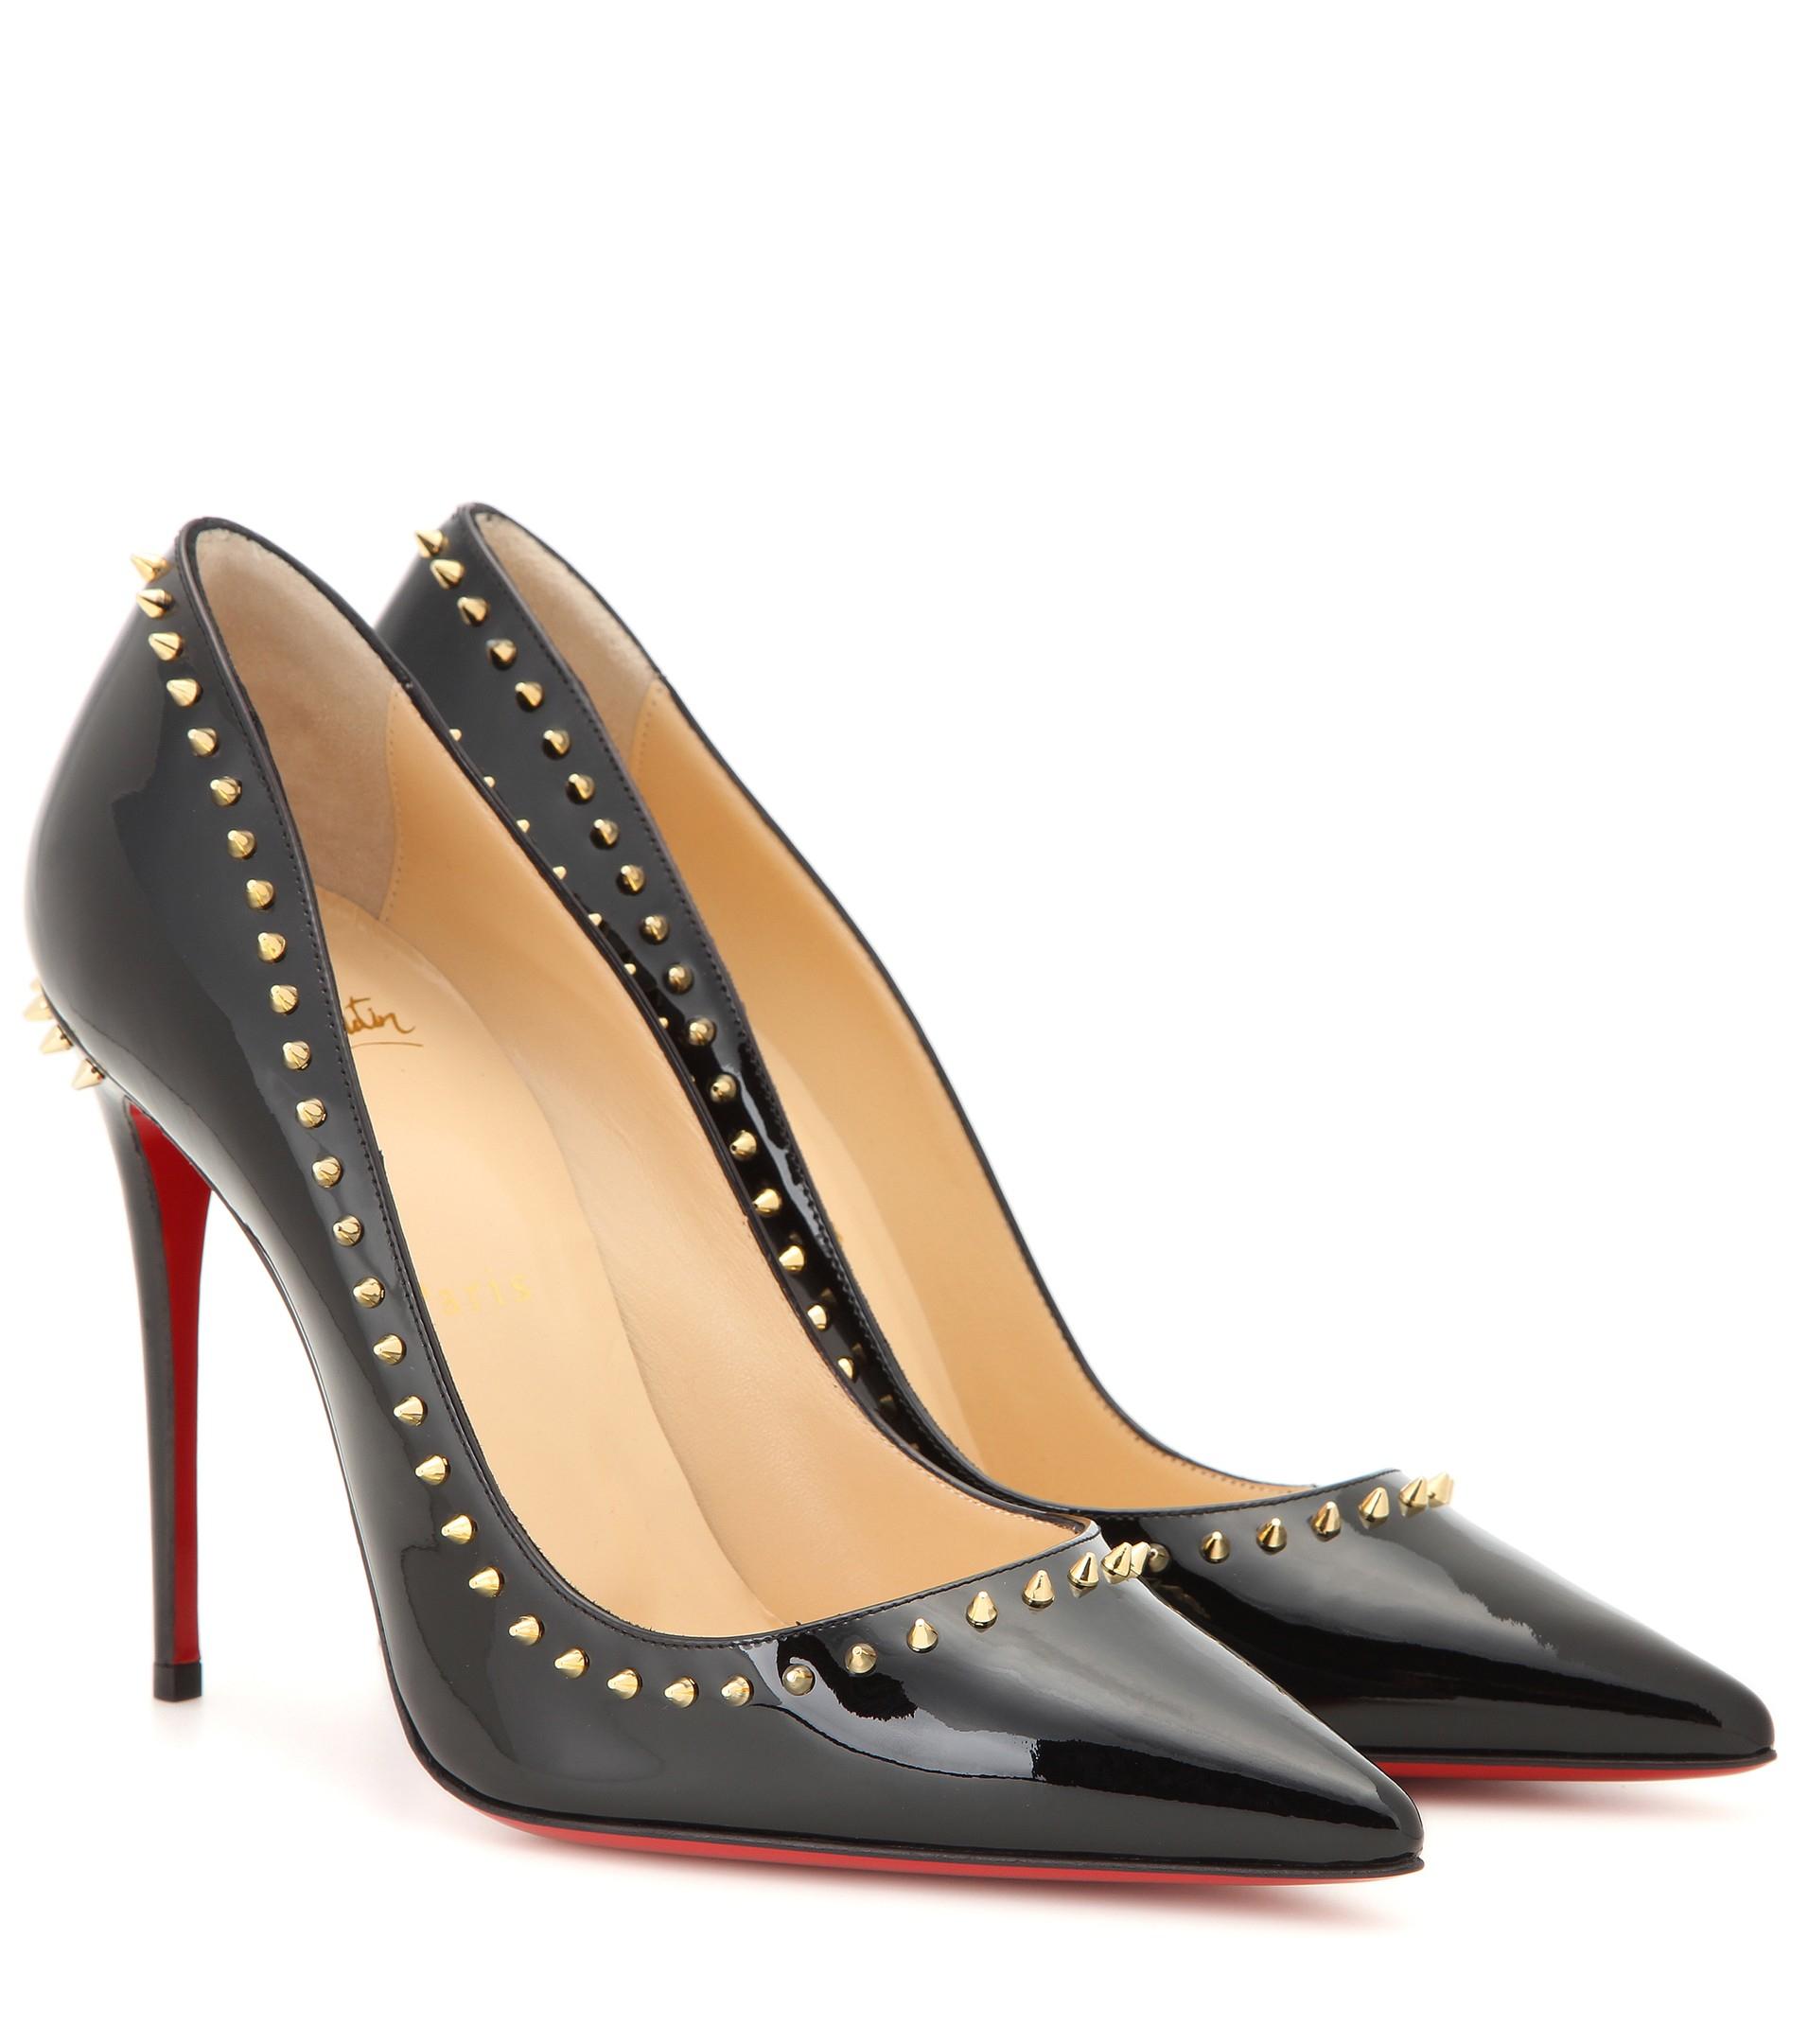 christian louboutins replicas - christian-louboutin-blackgold-anjalina-100-patent-leather-pumps-black-product-0-733697420-normal.jpeg